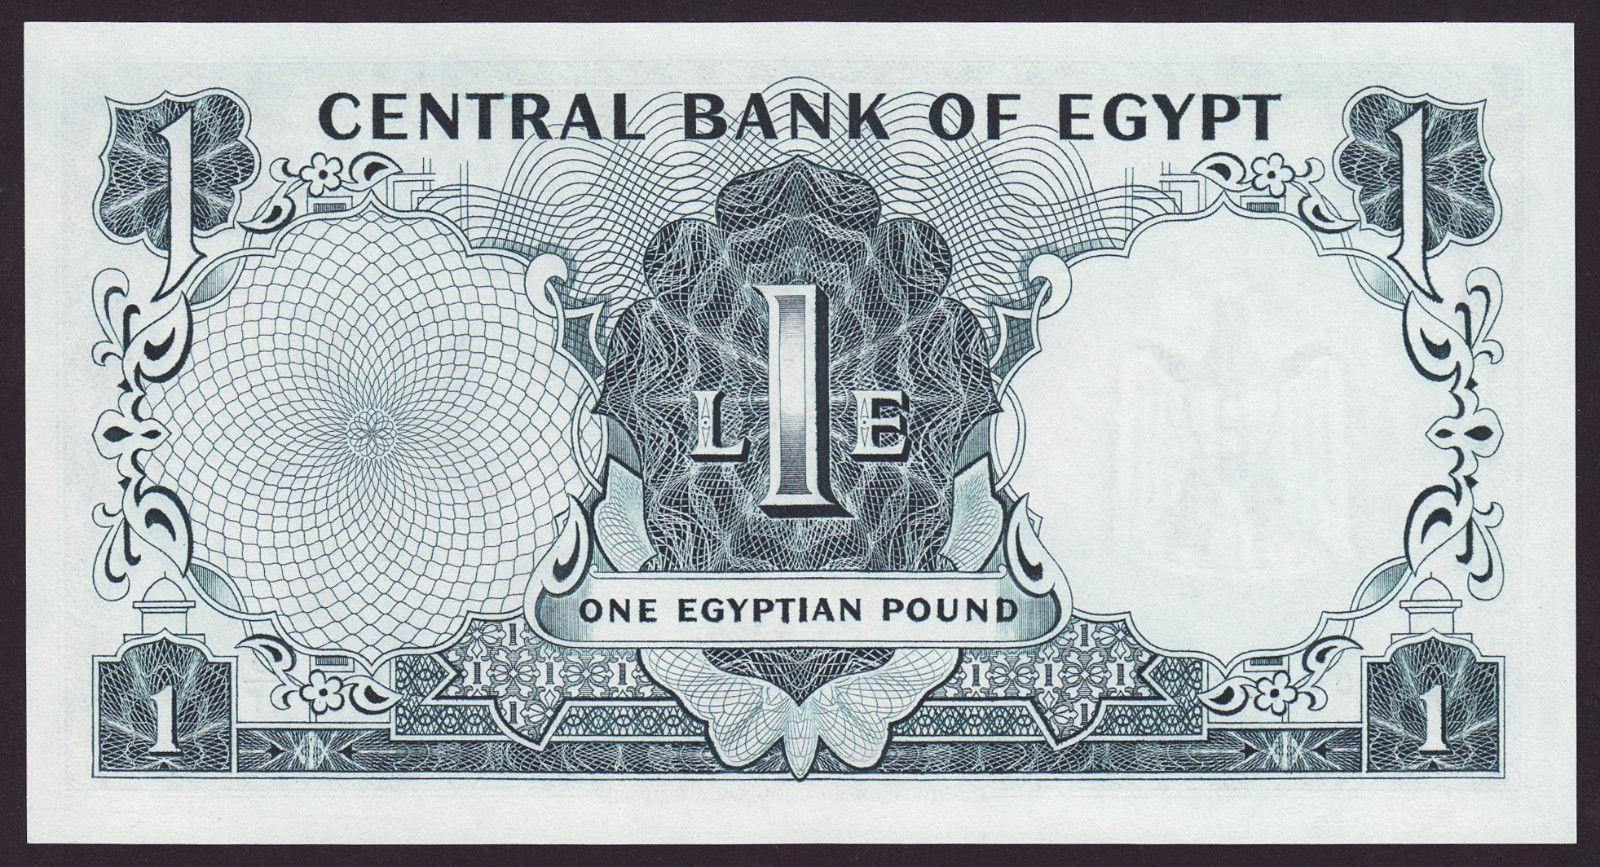 egypt 1 pound banknote 1967 pharaoh tutankhamunworld